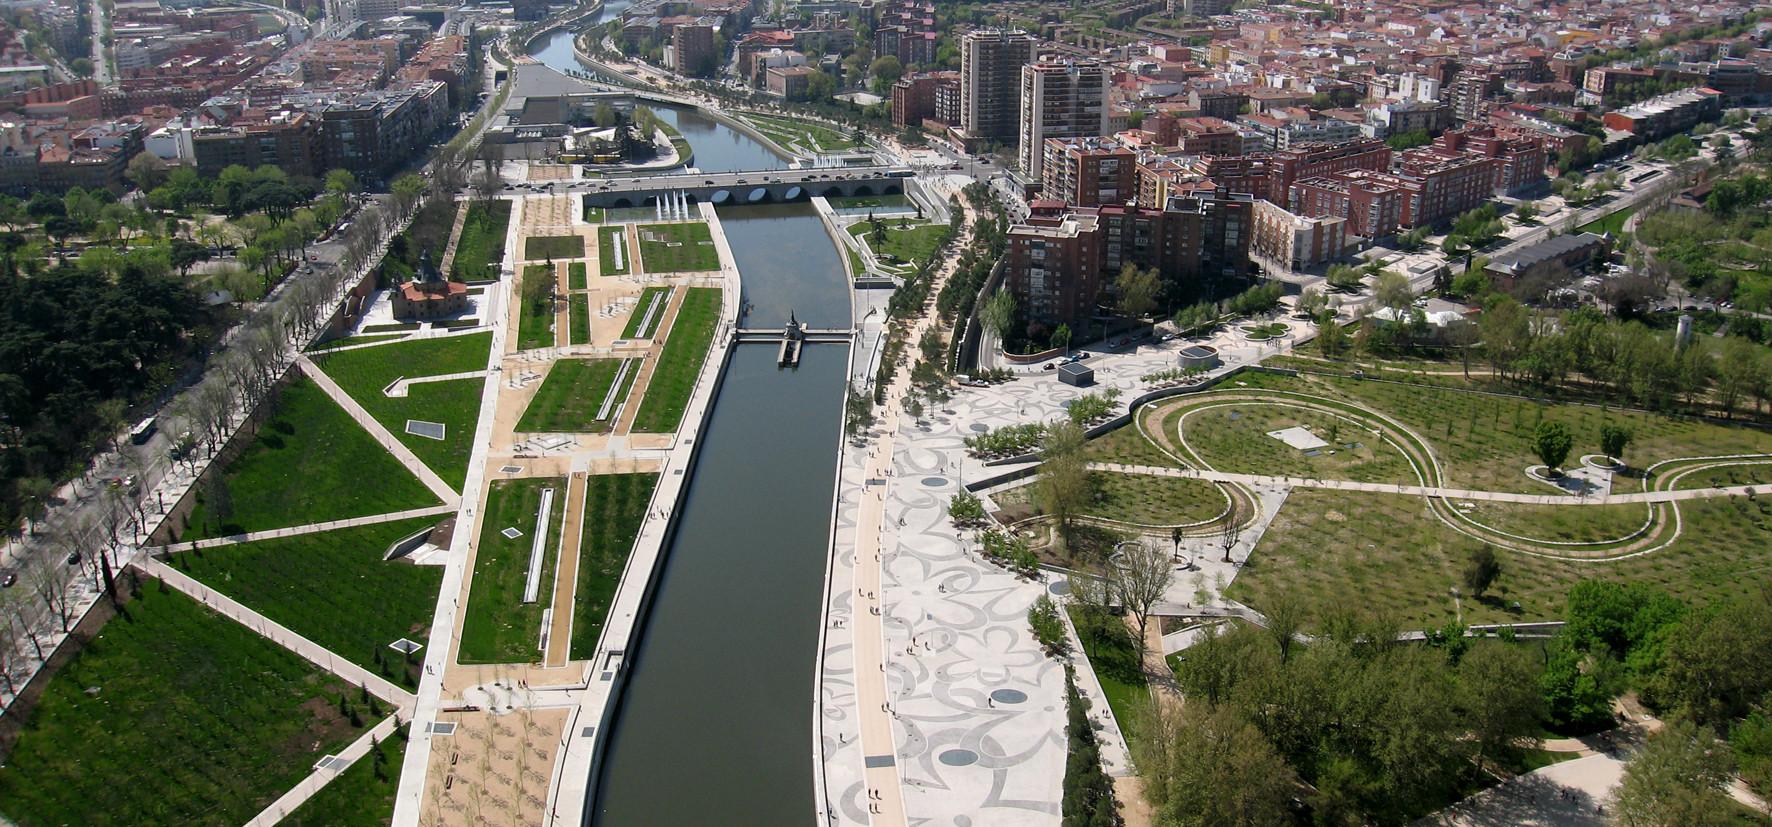 Madrid Rio: © Burgos & Garrido Arquitectos / Porras La Casta / Rubio & Á.-Sala / West8, Madrid, Spain